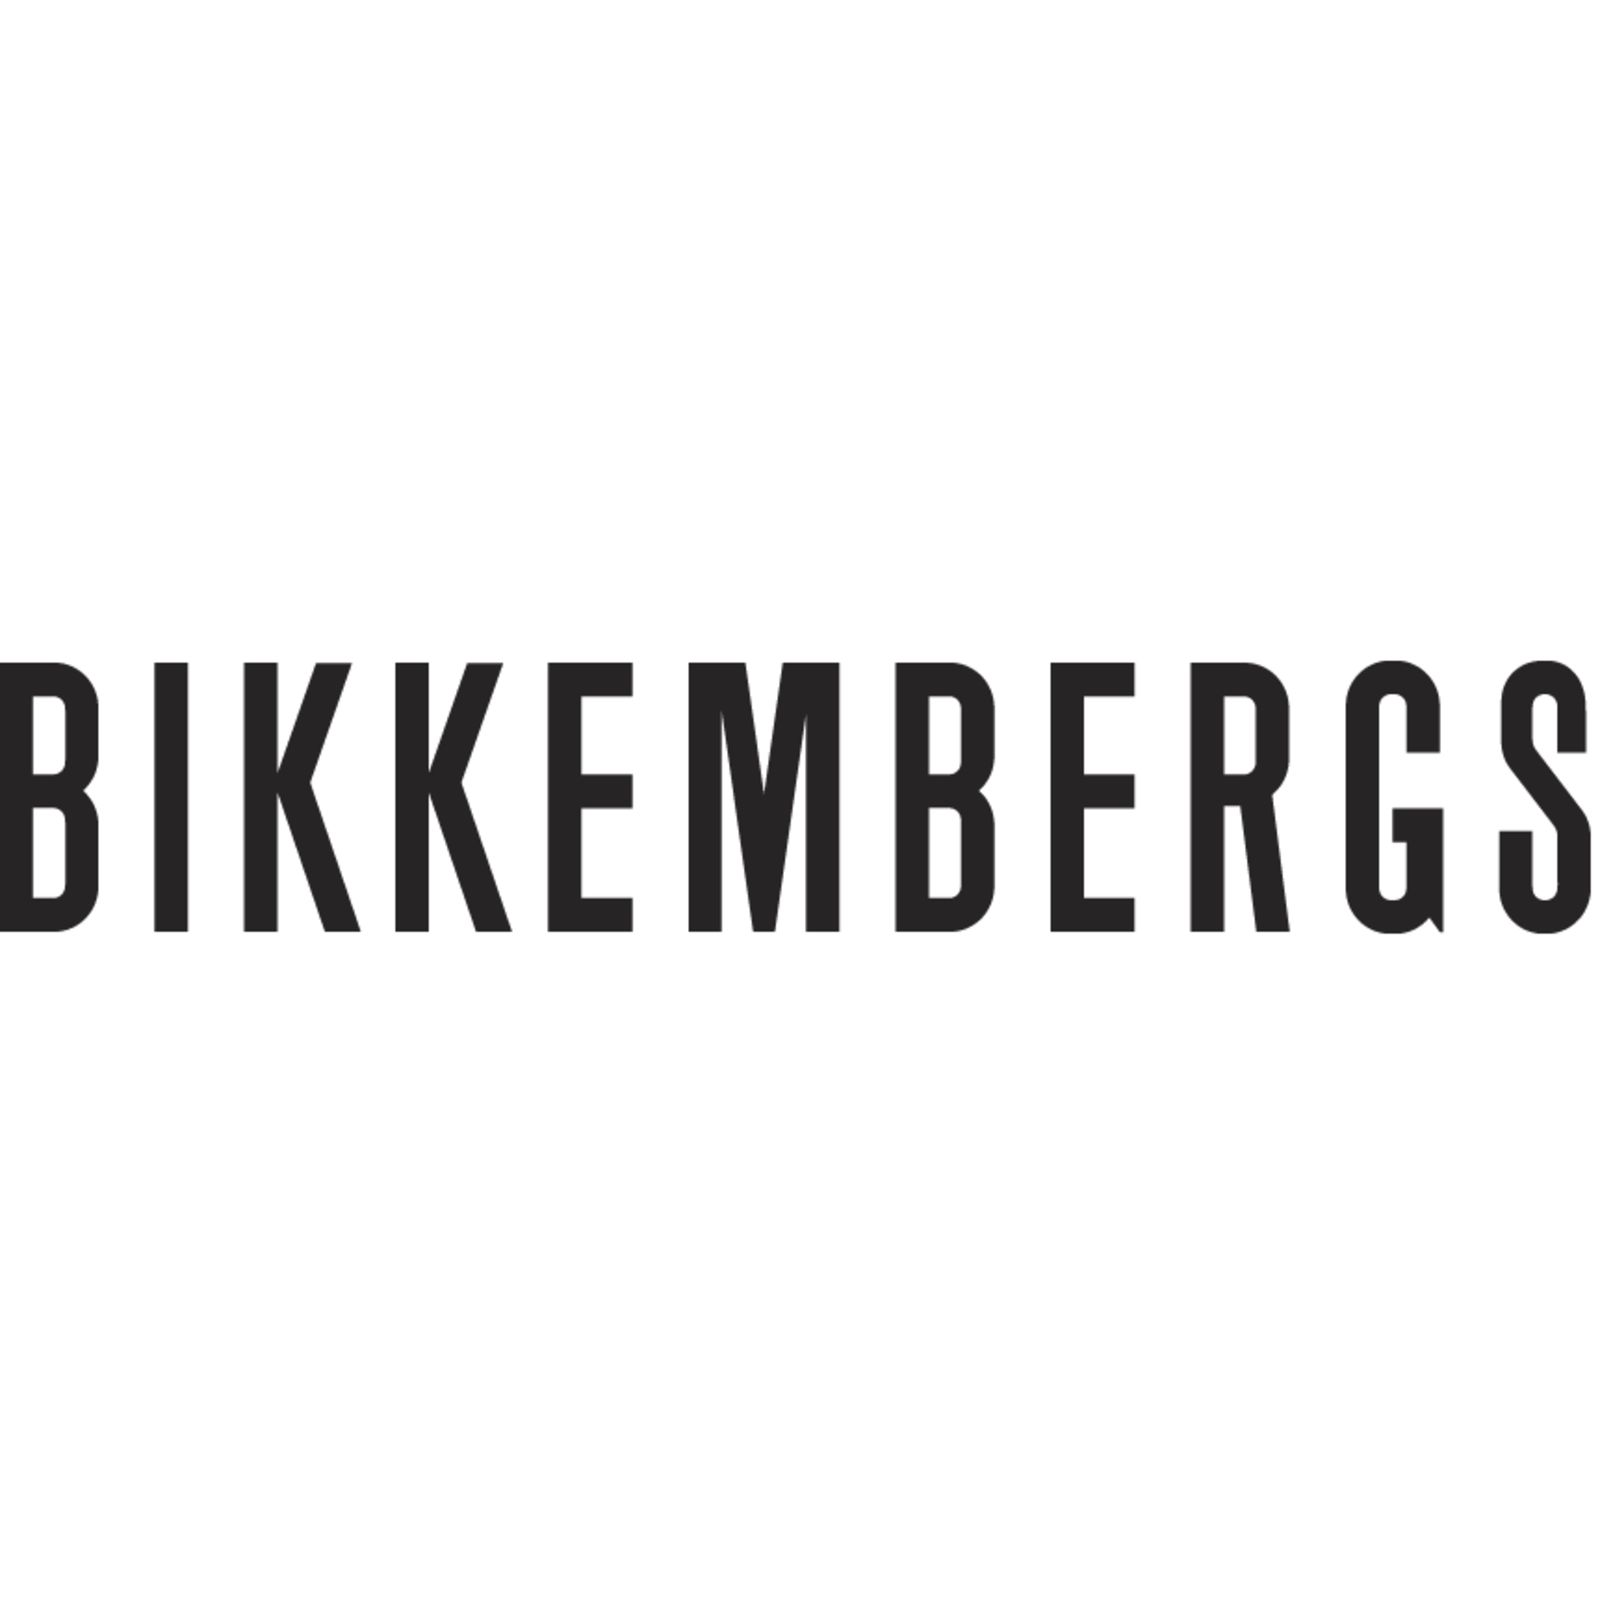 BIKKEMBERGS (Изображение 1)